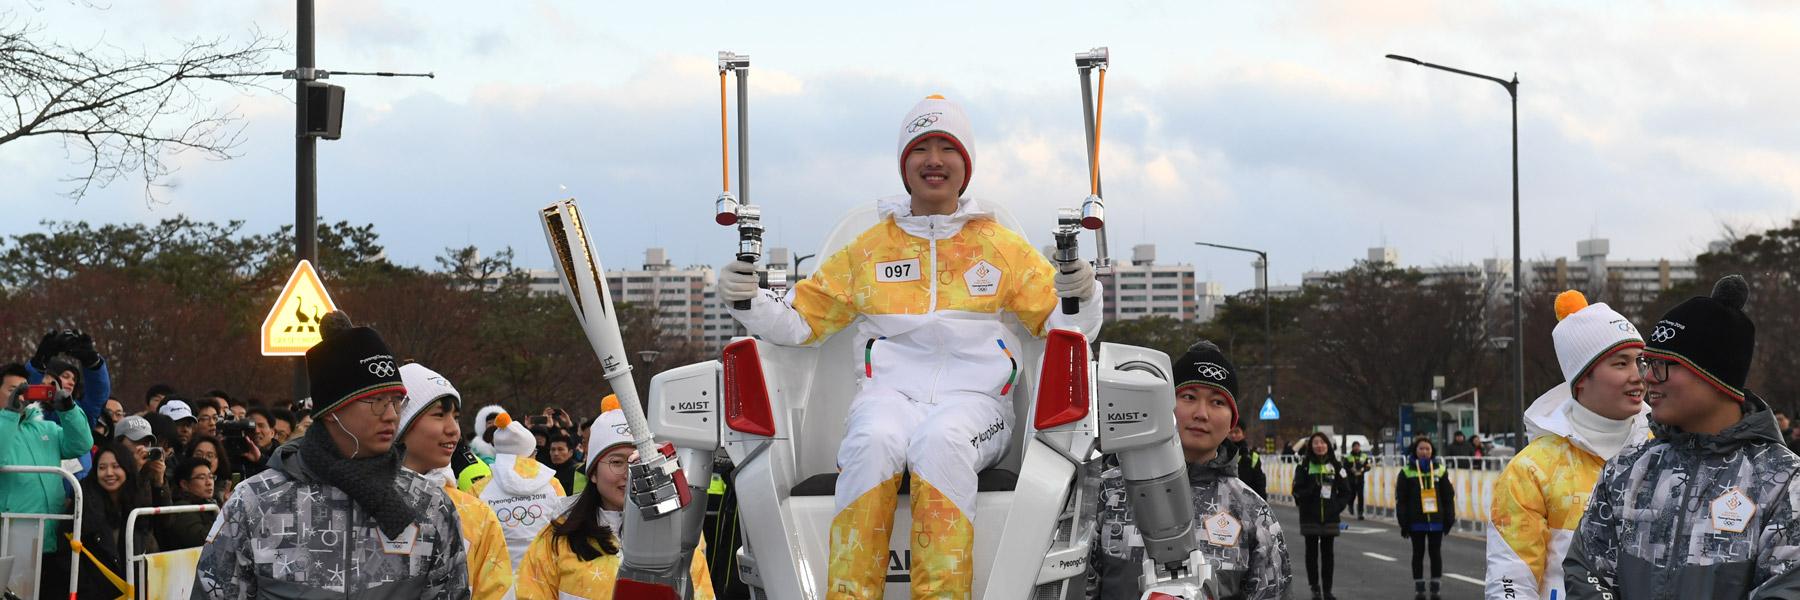 pyongyang_winter_games_south_korea